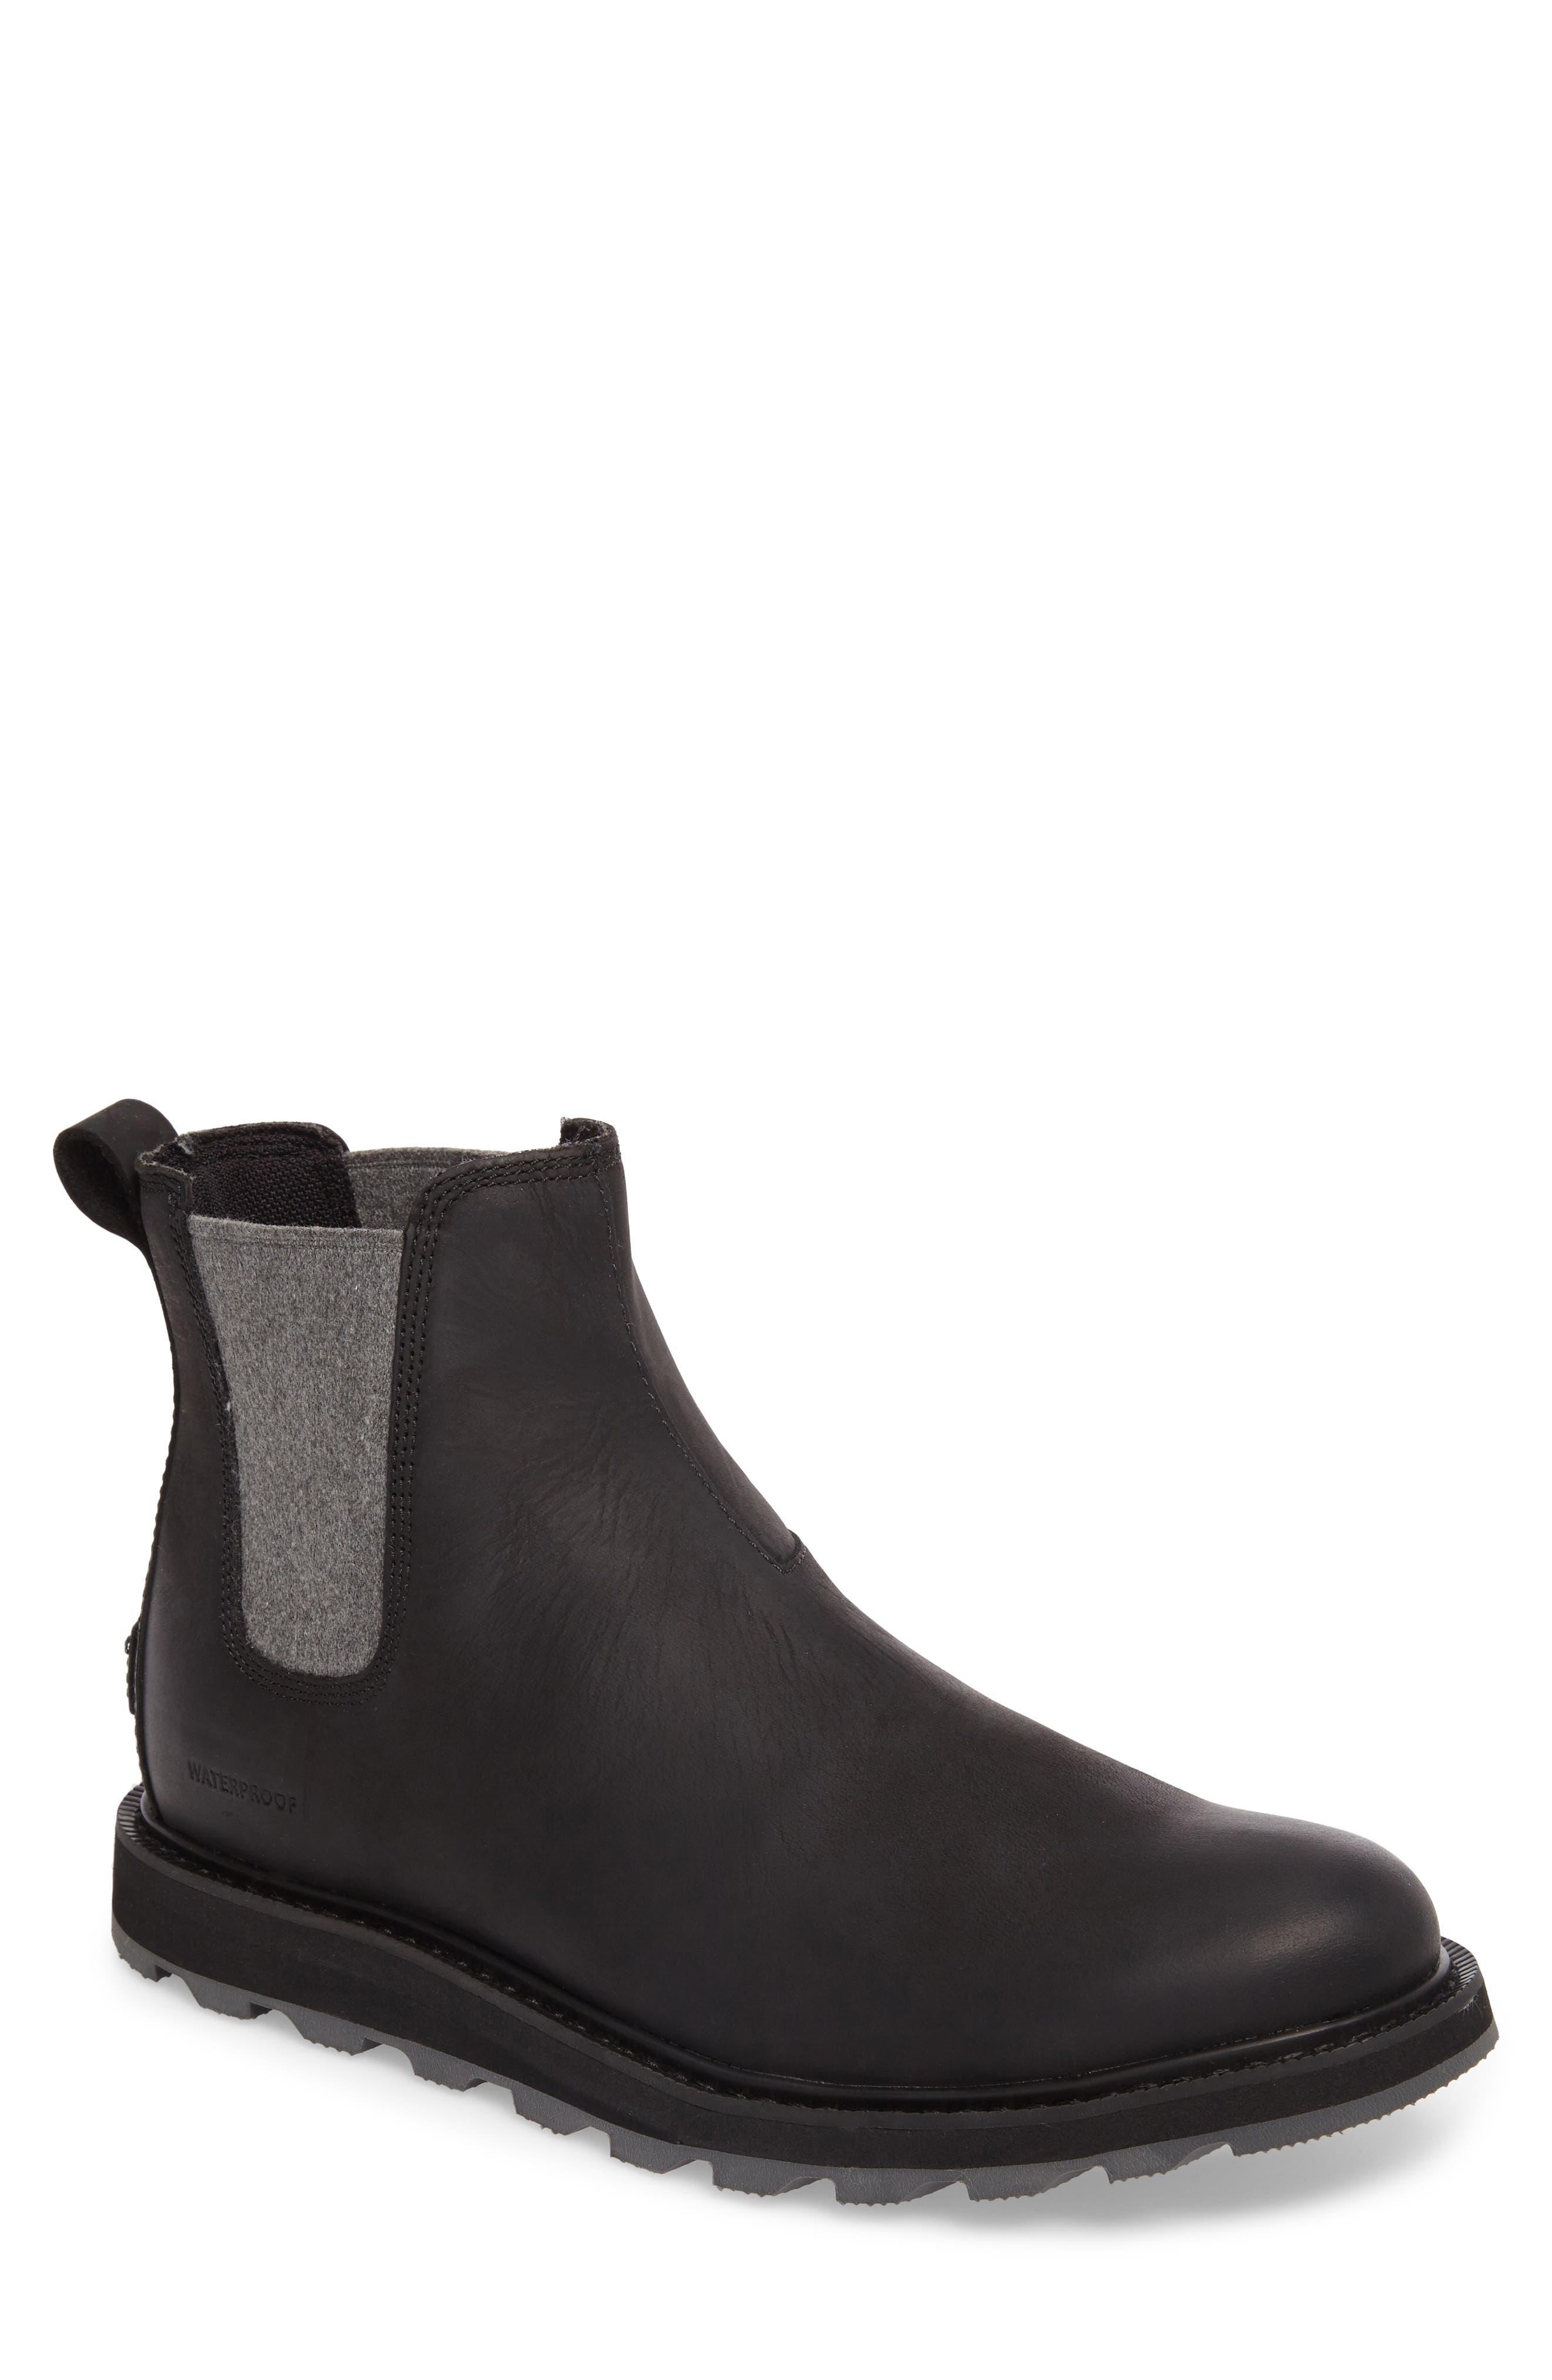 Madson Waterproof Chelsea Boot,                         Main,                         color, Black